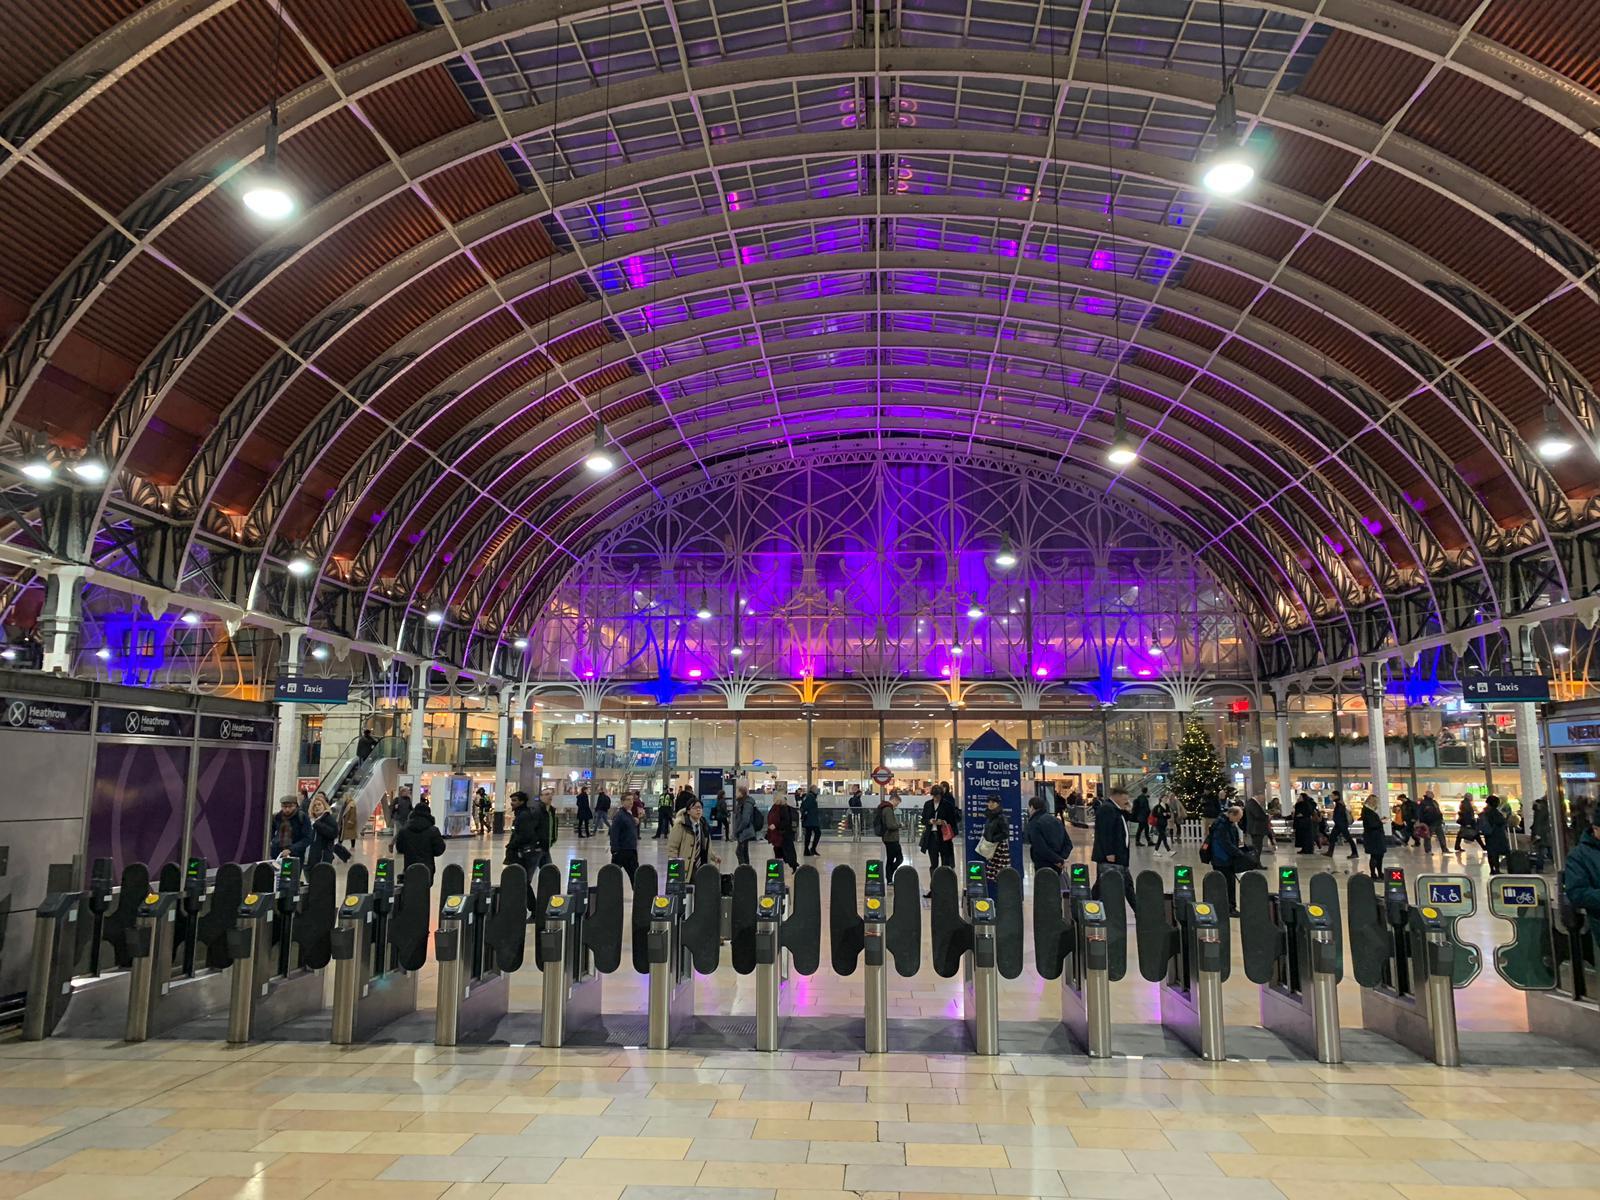 Lighting up of Paddington Station